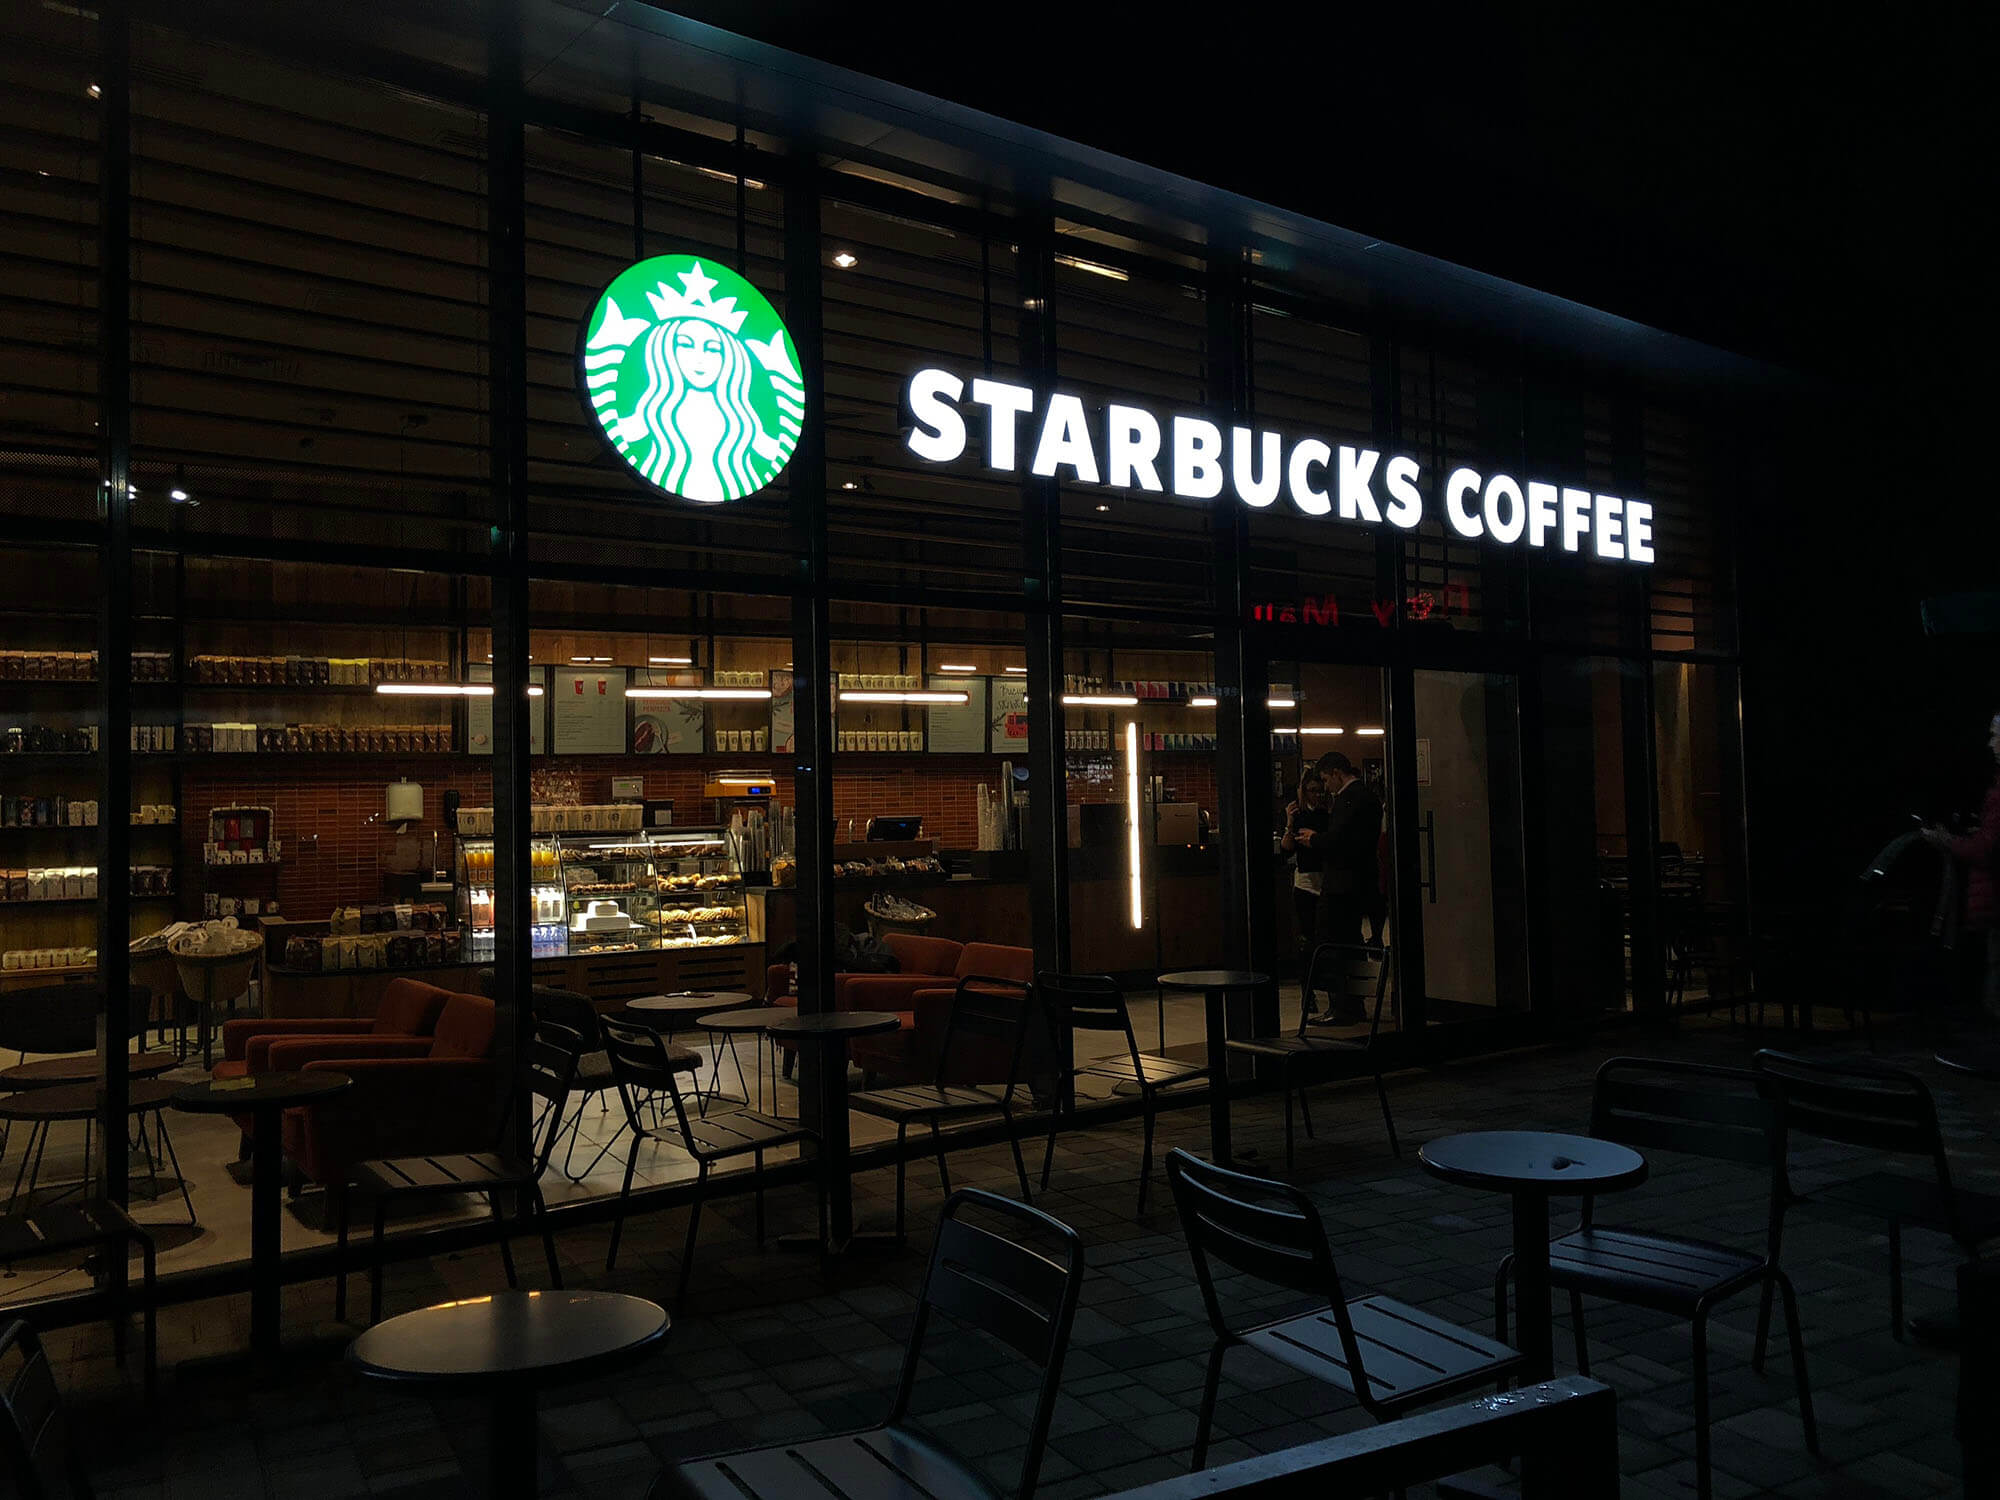 Starbucks a deschis cafenea la Galați